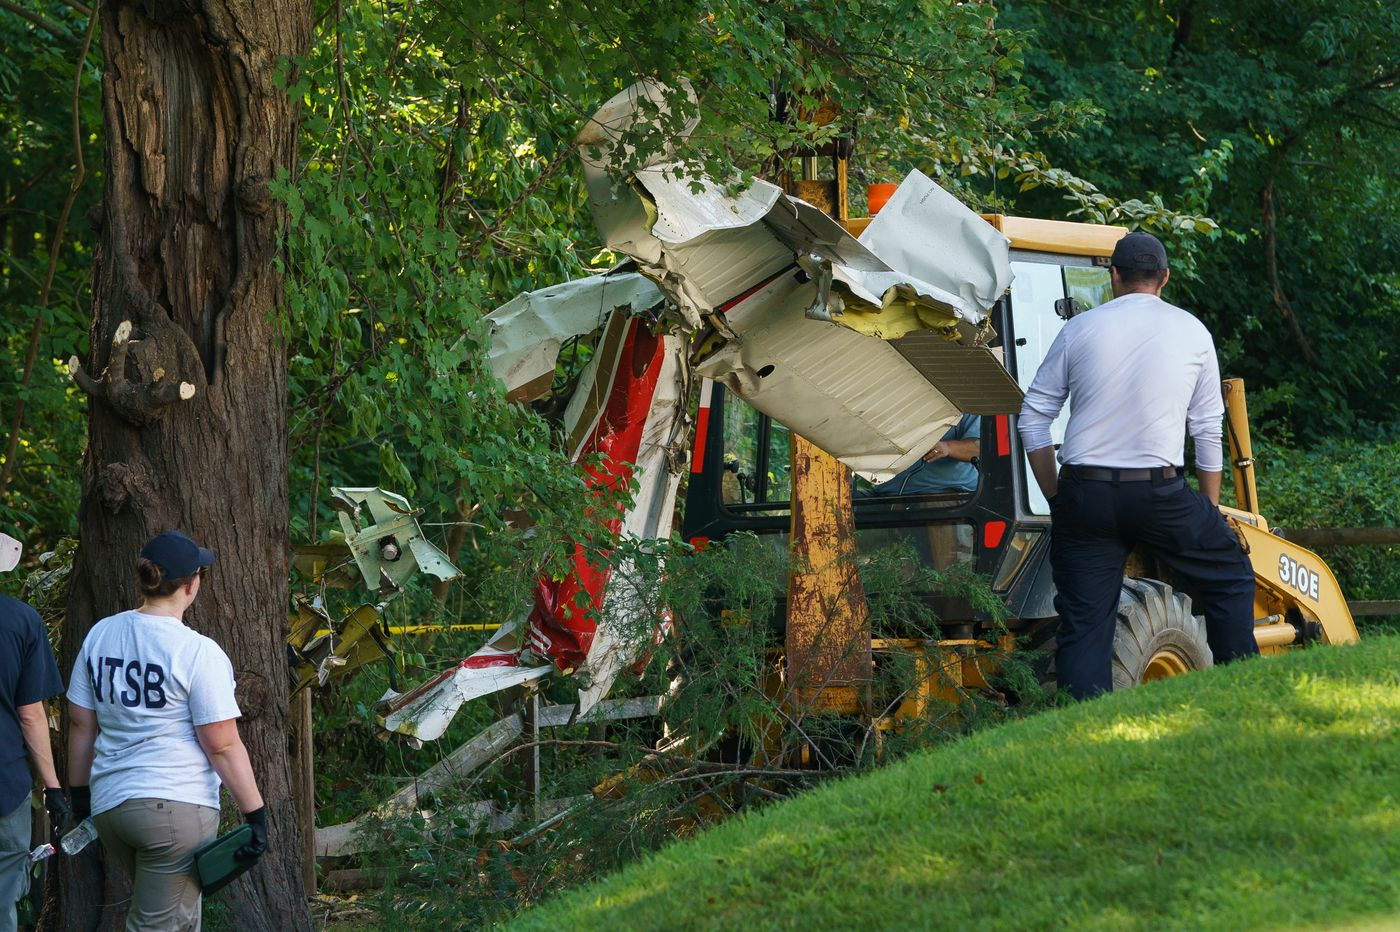 Investigators seek clues amid wreckage of plane crash that